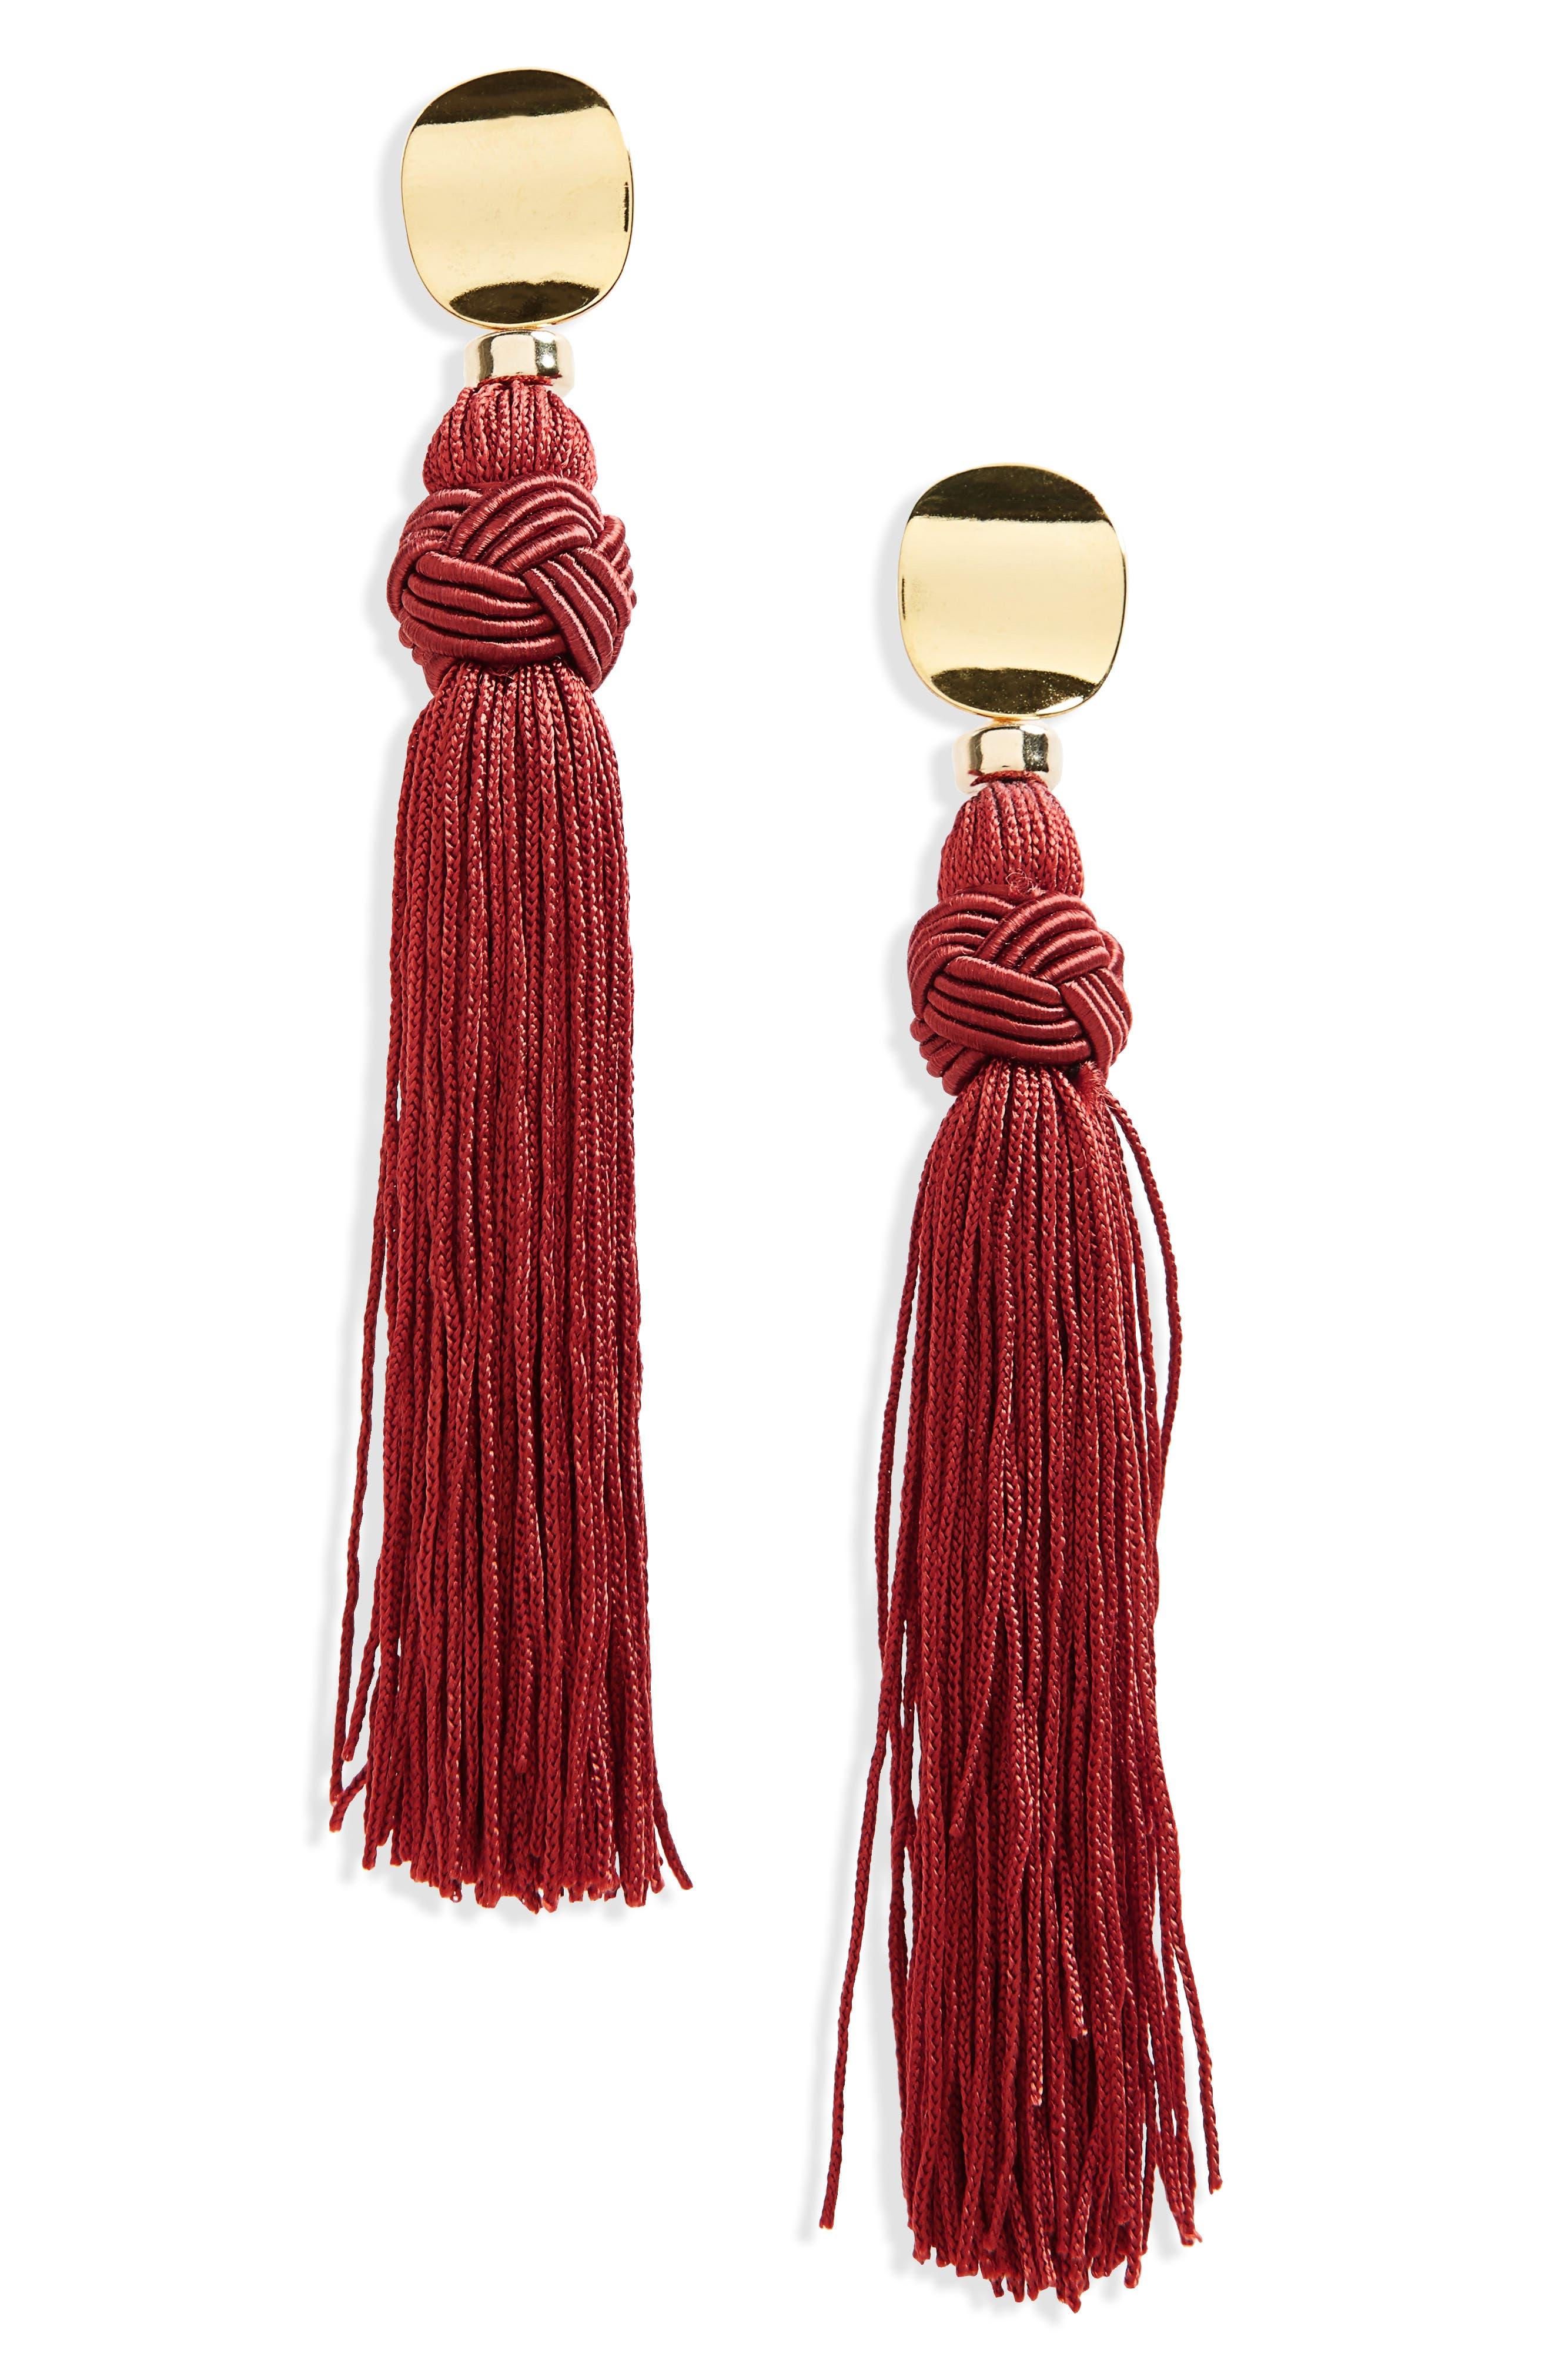 Sienna Luxe Tassel Drop Earrings,                             Main thumbnail 1, color,                             Burgundy